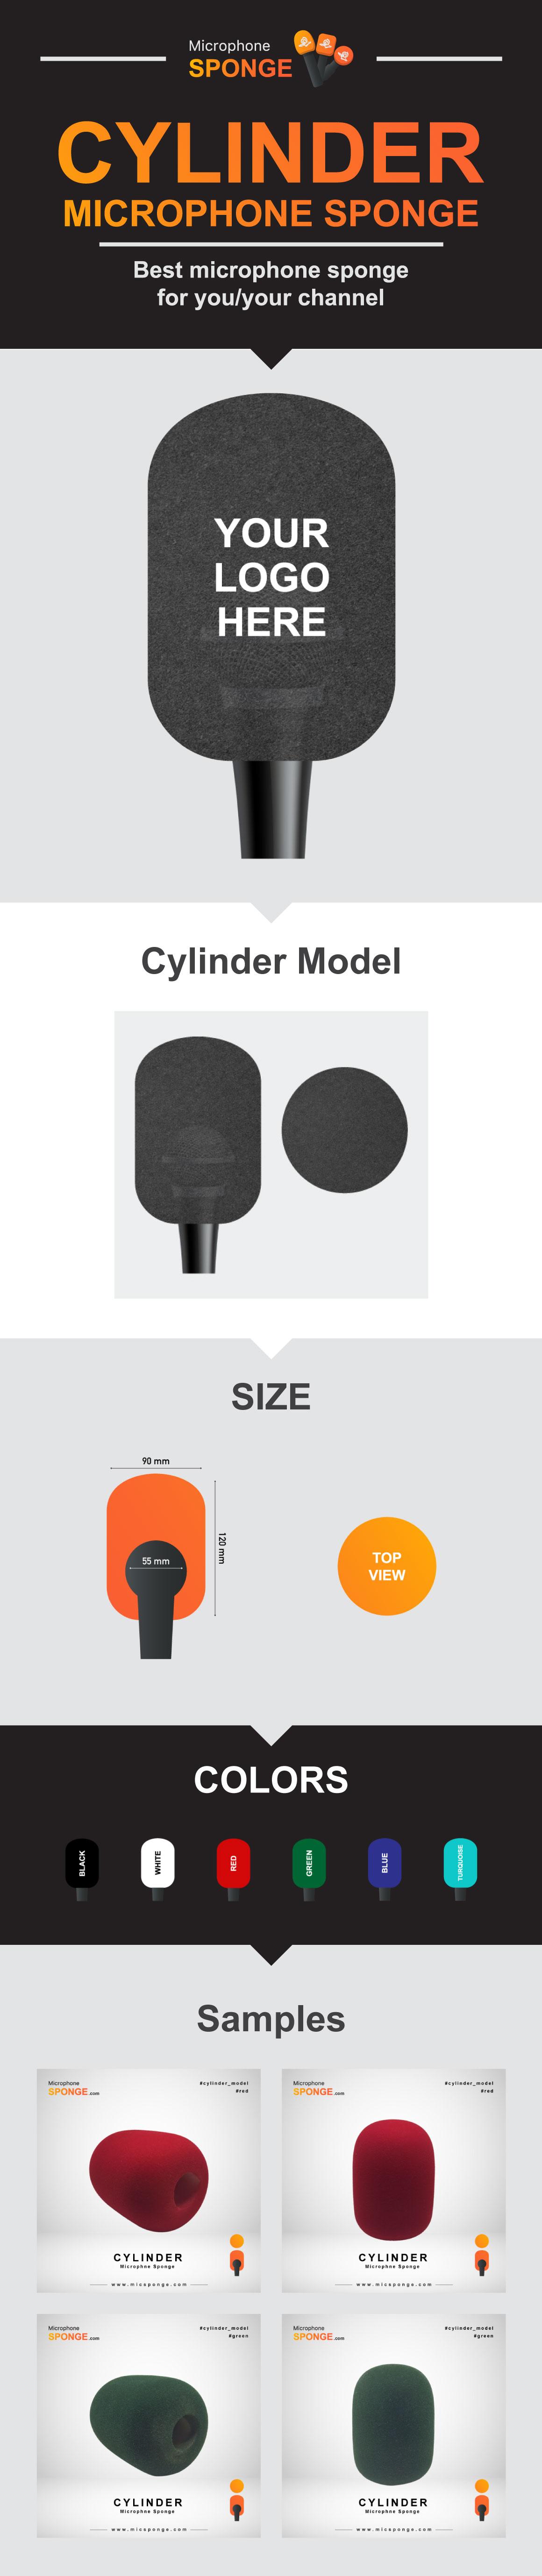 Microphone Sponge Cylinder